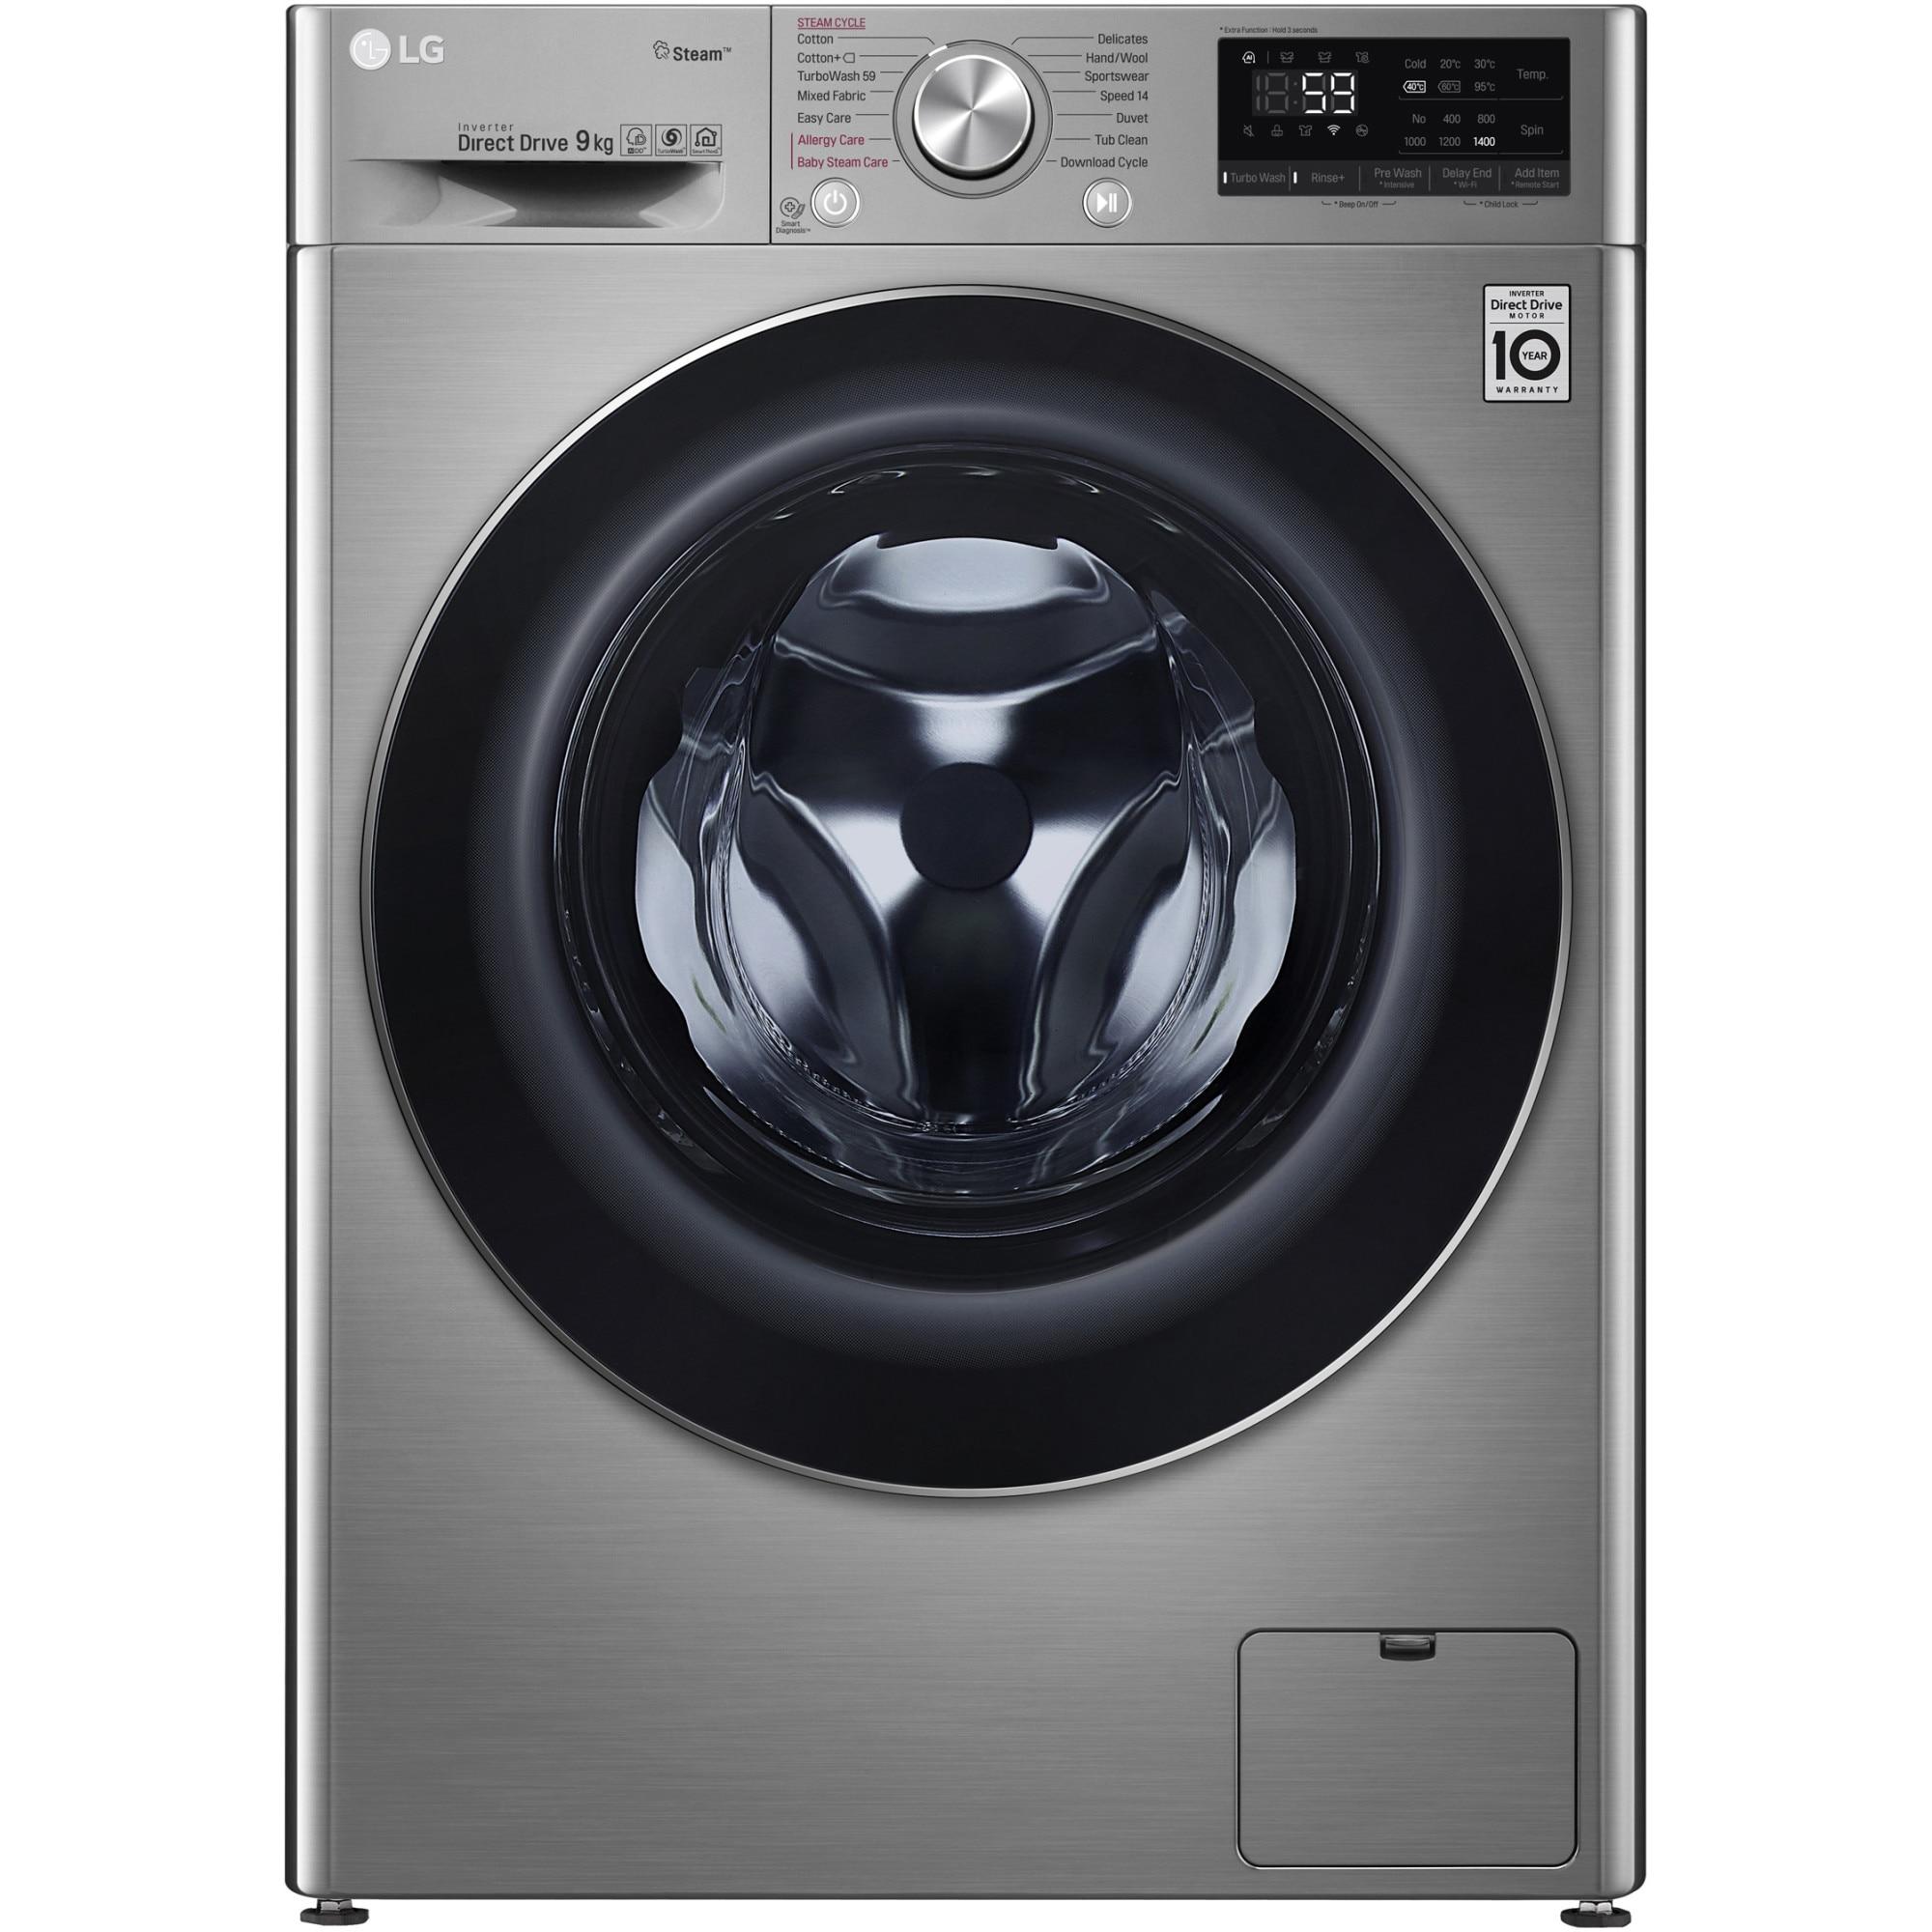 Fotografie Masina de spalat rufe LG F4WN609S2T, 9 kg, 1400 RPM, Clasa D, Direct Drive, Turbo Wash, Steam, Smart Diagnoisis, WiFi, Argintiu